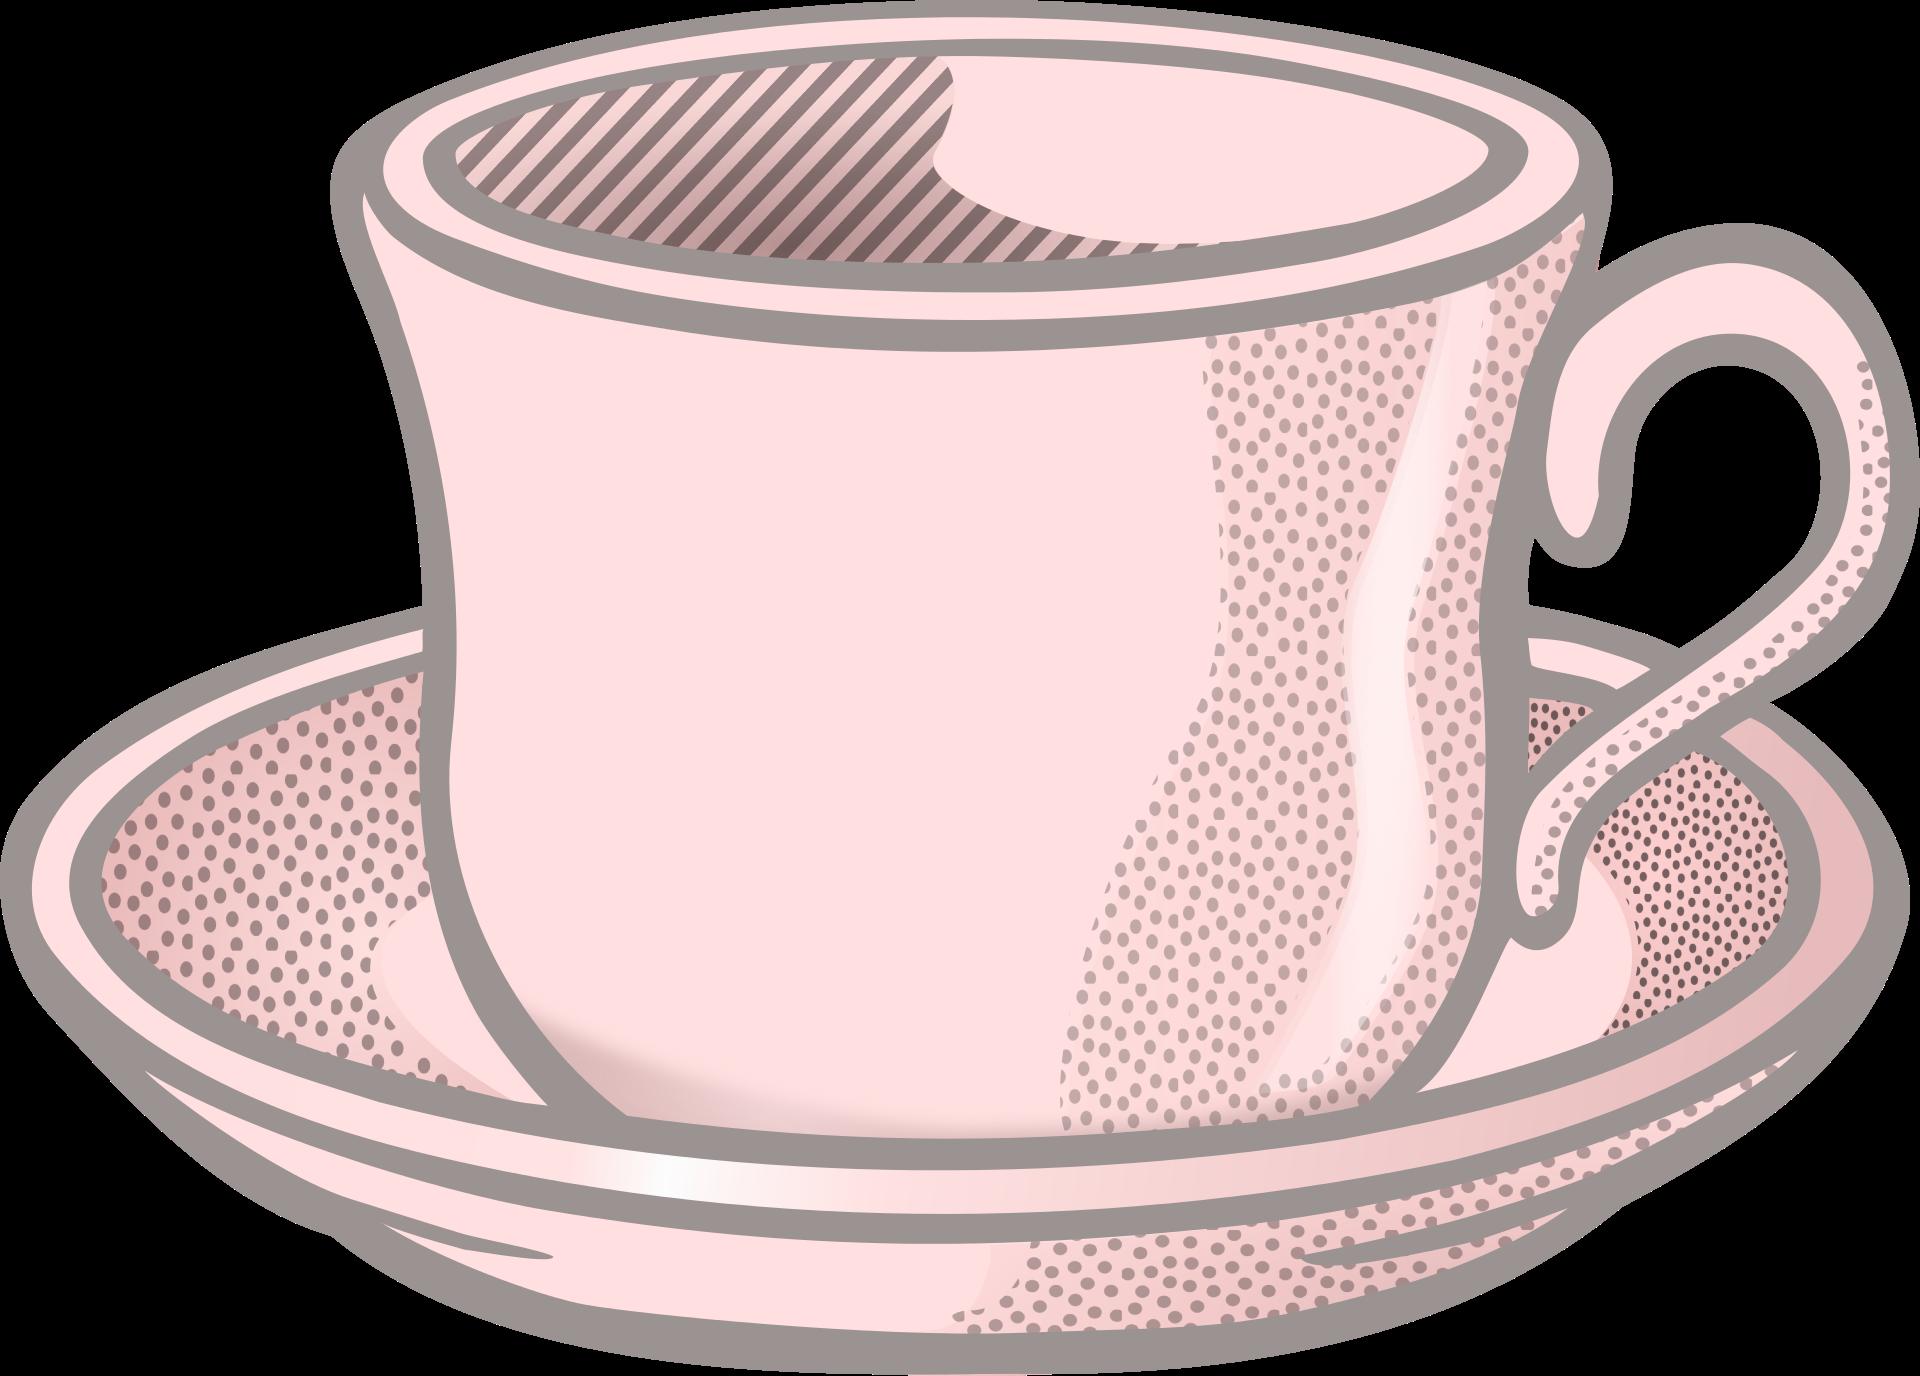 picture transparent Teacup and saucer clipart. Clip art pink tea